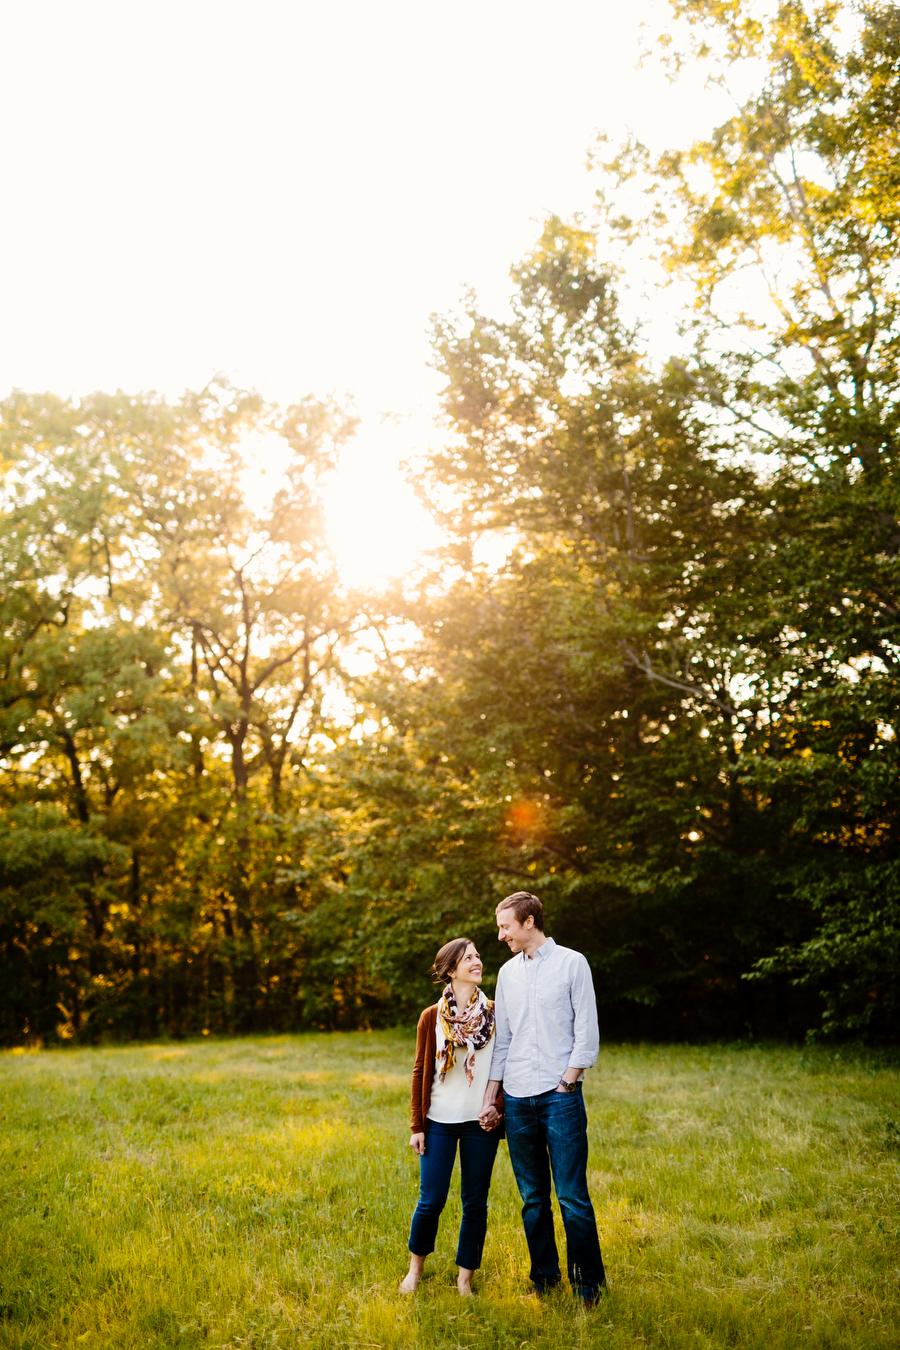 Watertown_Belmont_Engagement_Photography-100.JPG